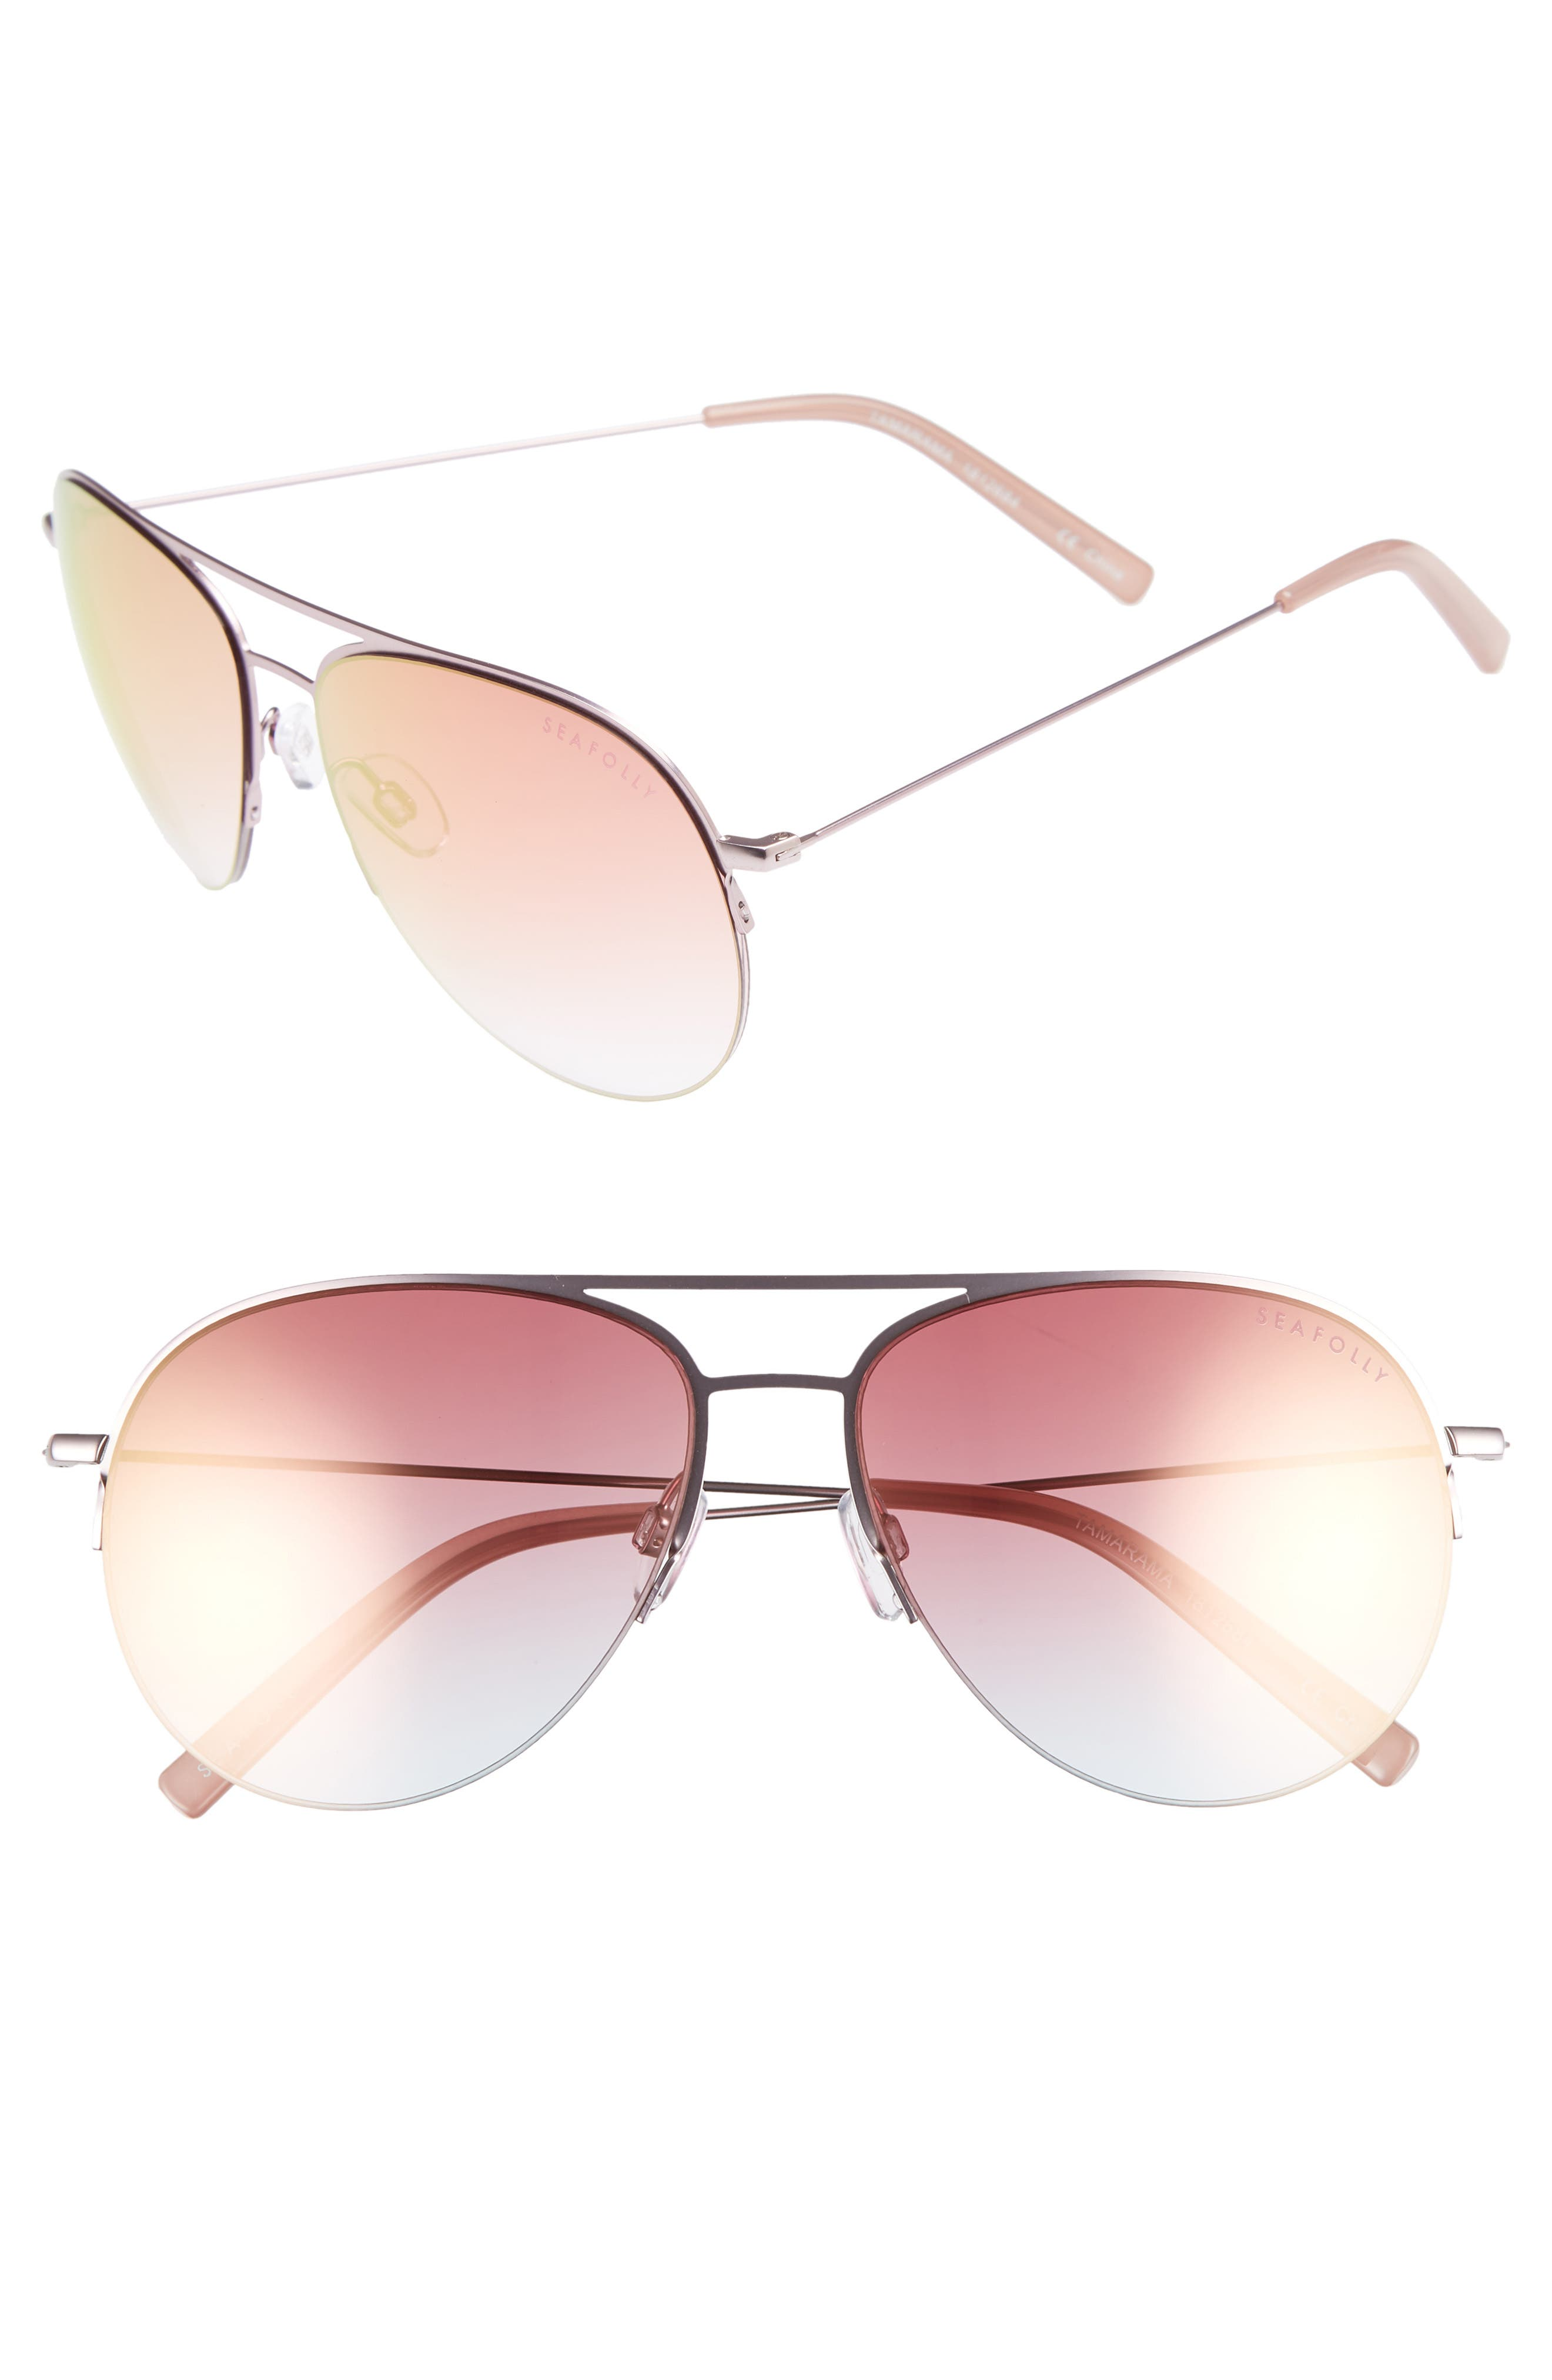 Tamarama 60mm Aviator Sunglasses,                         Main,                         color, 612